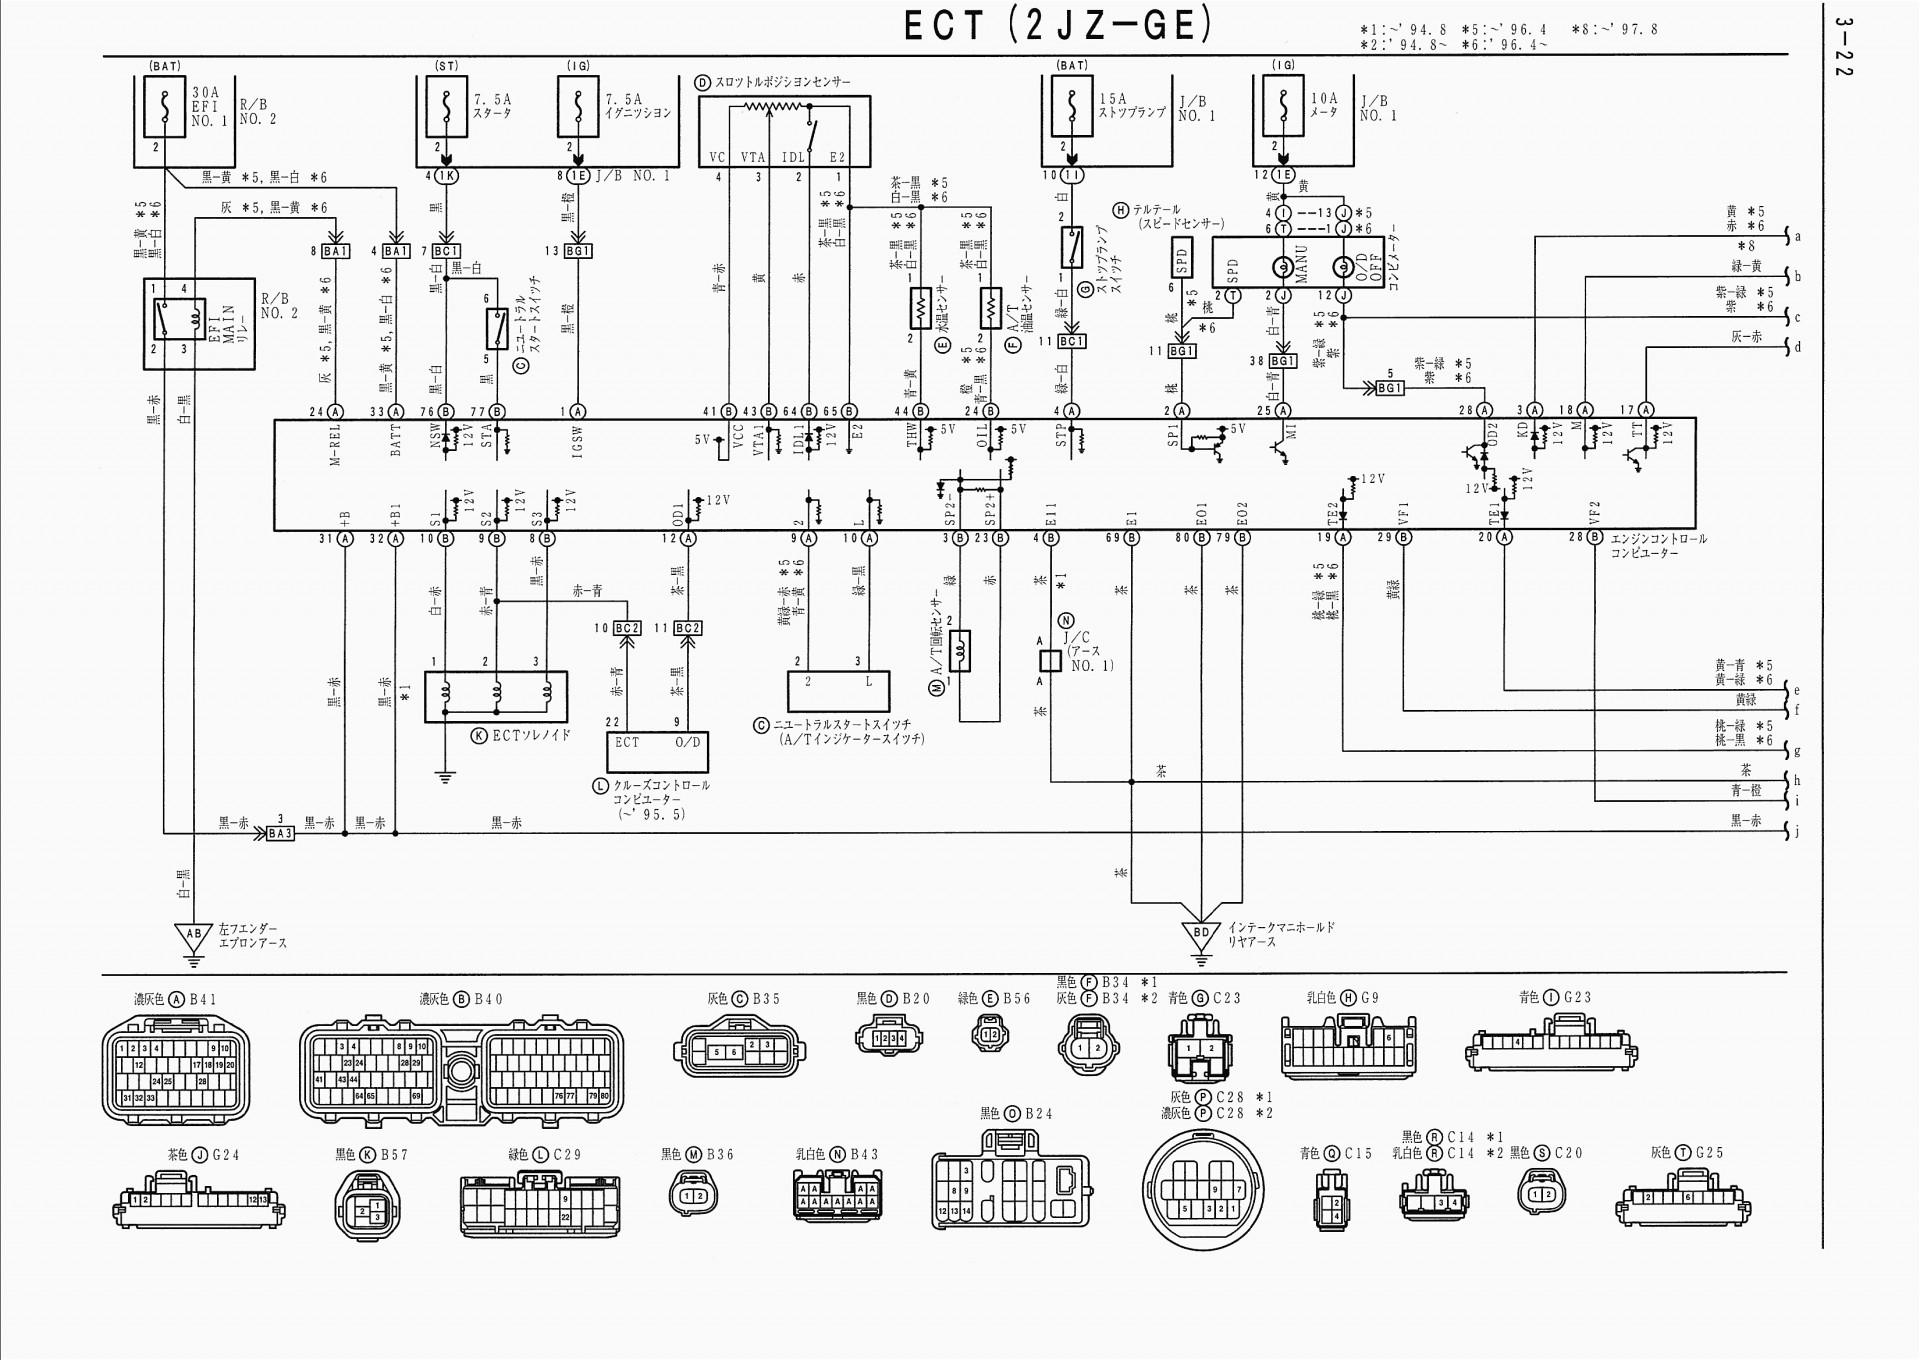 wiring diagram smeg oven illustration of wiring diagram u2022 rh prowiringdiagram today smeg oven selector switch wiring diagram smeg oven selector switch wiring diagram